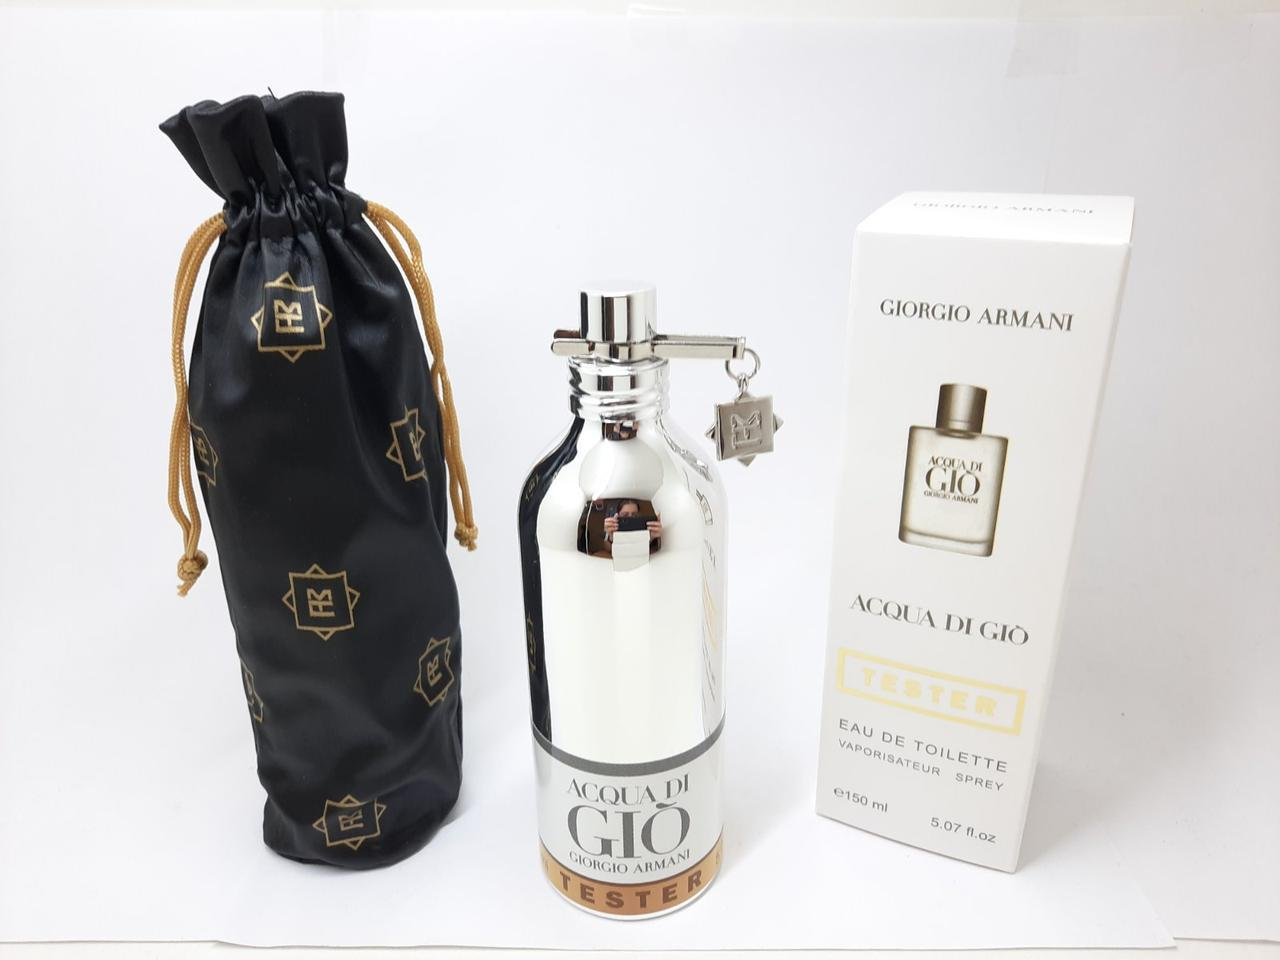 Тестер мужской парфюмированой воды Giorgio Armani Acqua di Gio pour homme MONTALE(Аква Ди Джио Пур Хом) 150 мл